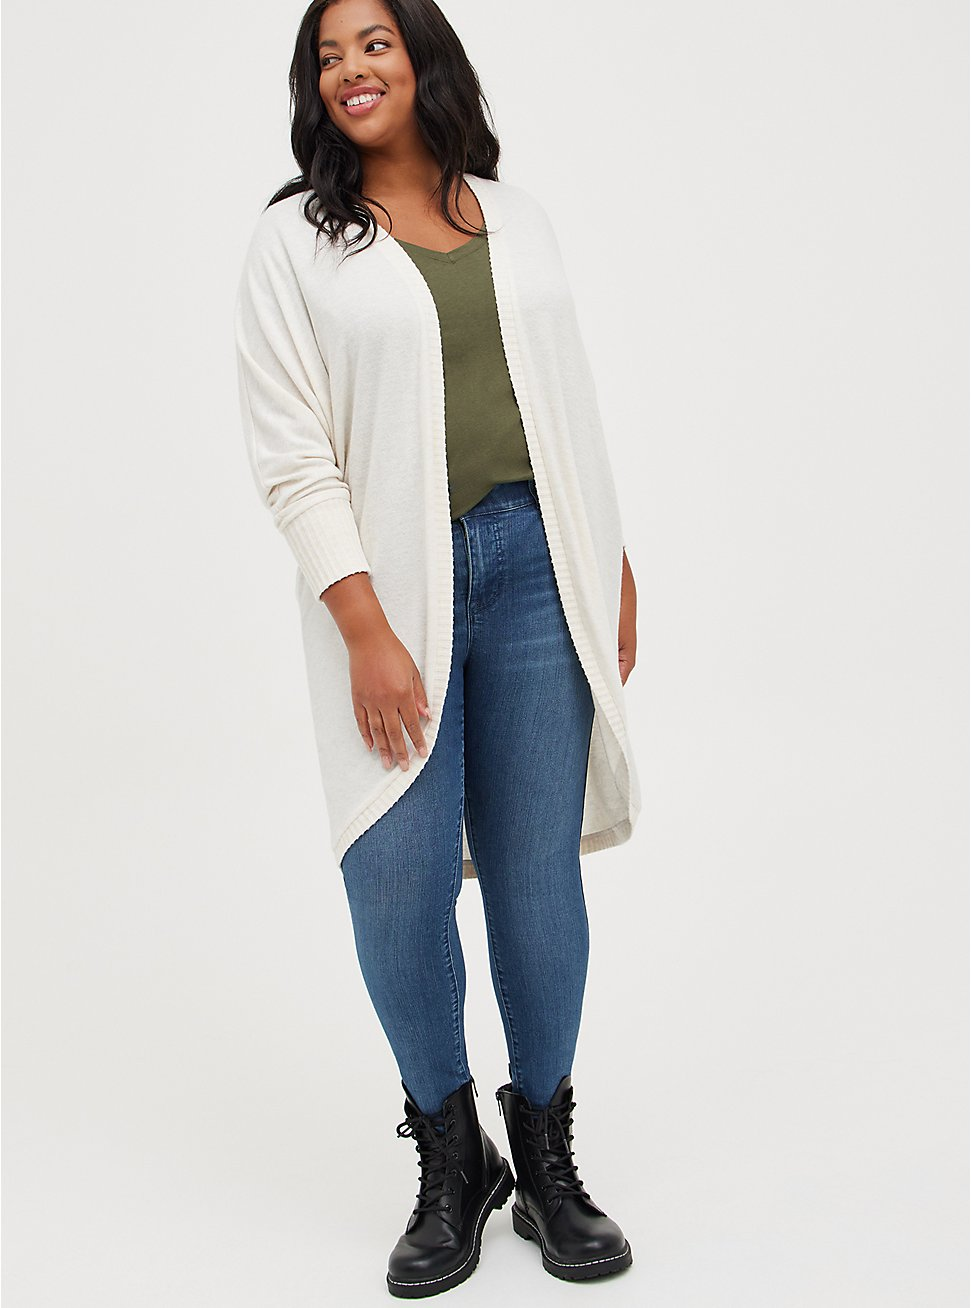 Cocoon Kimono - Super Soft Plush Heather Oatmeal, TAN/BEIGE, hi-res